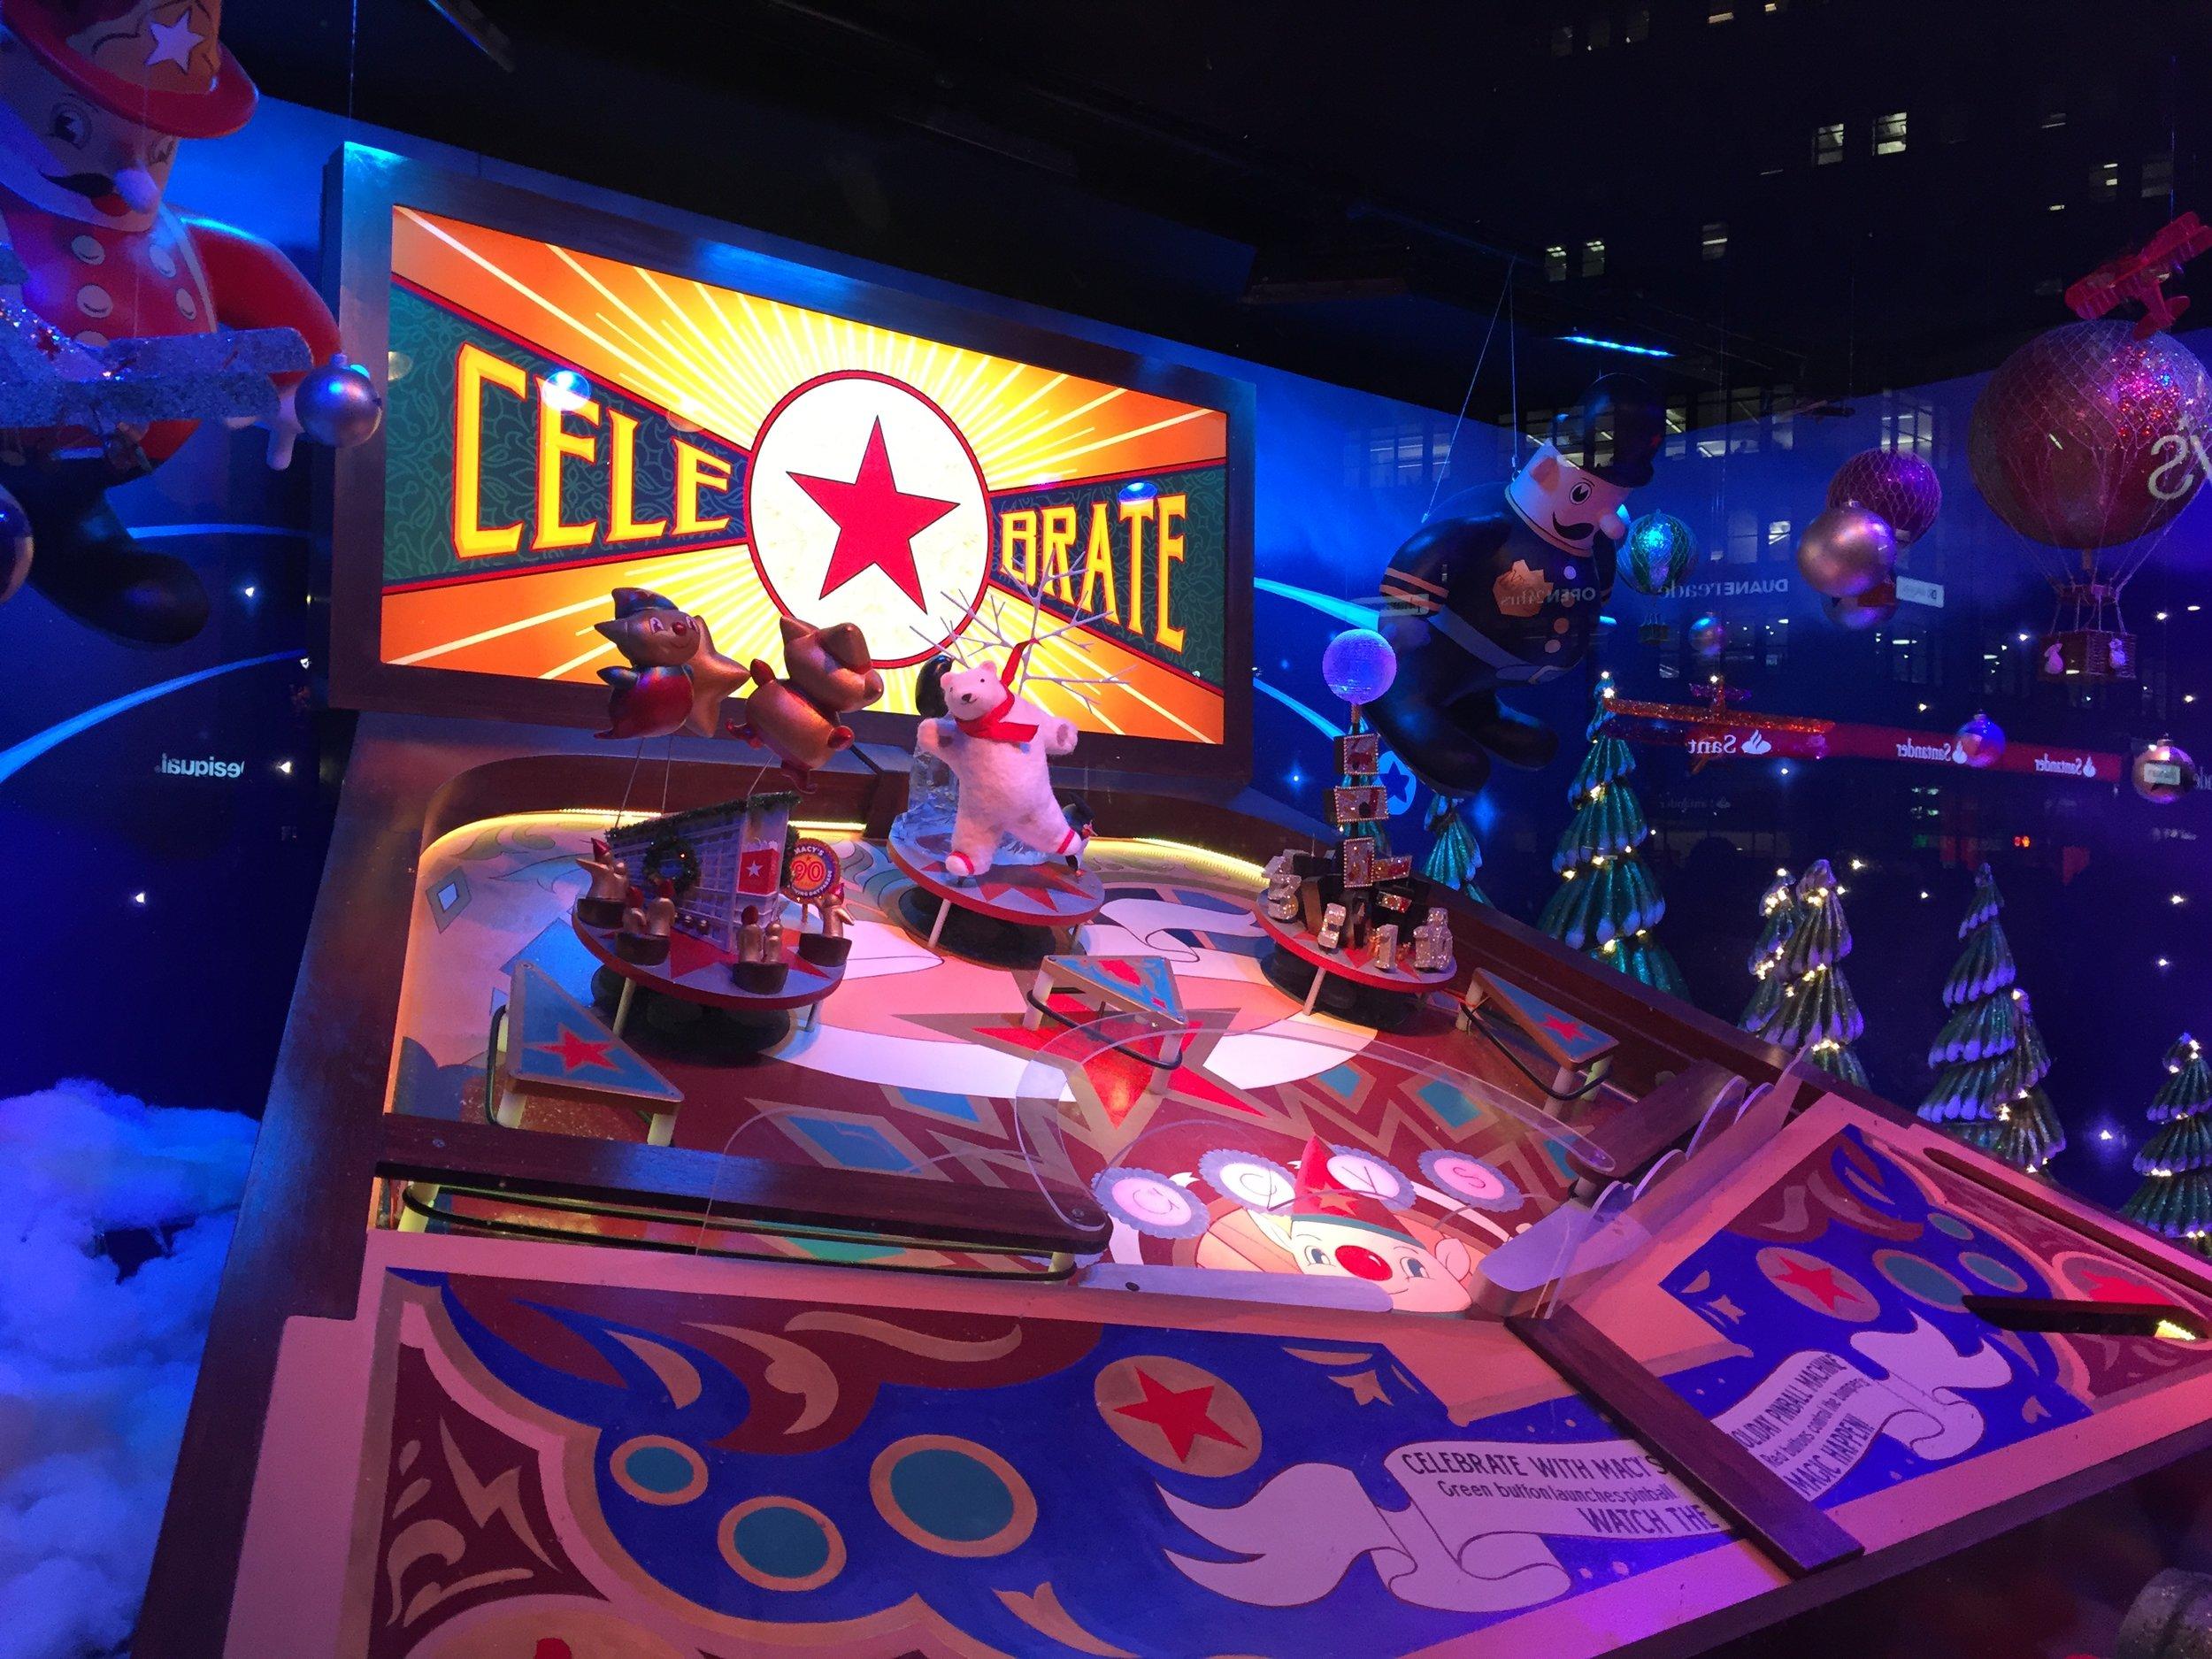 An interactive giant pinball machine